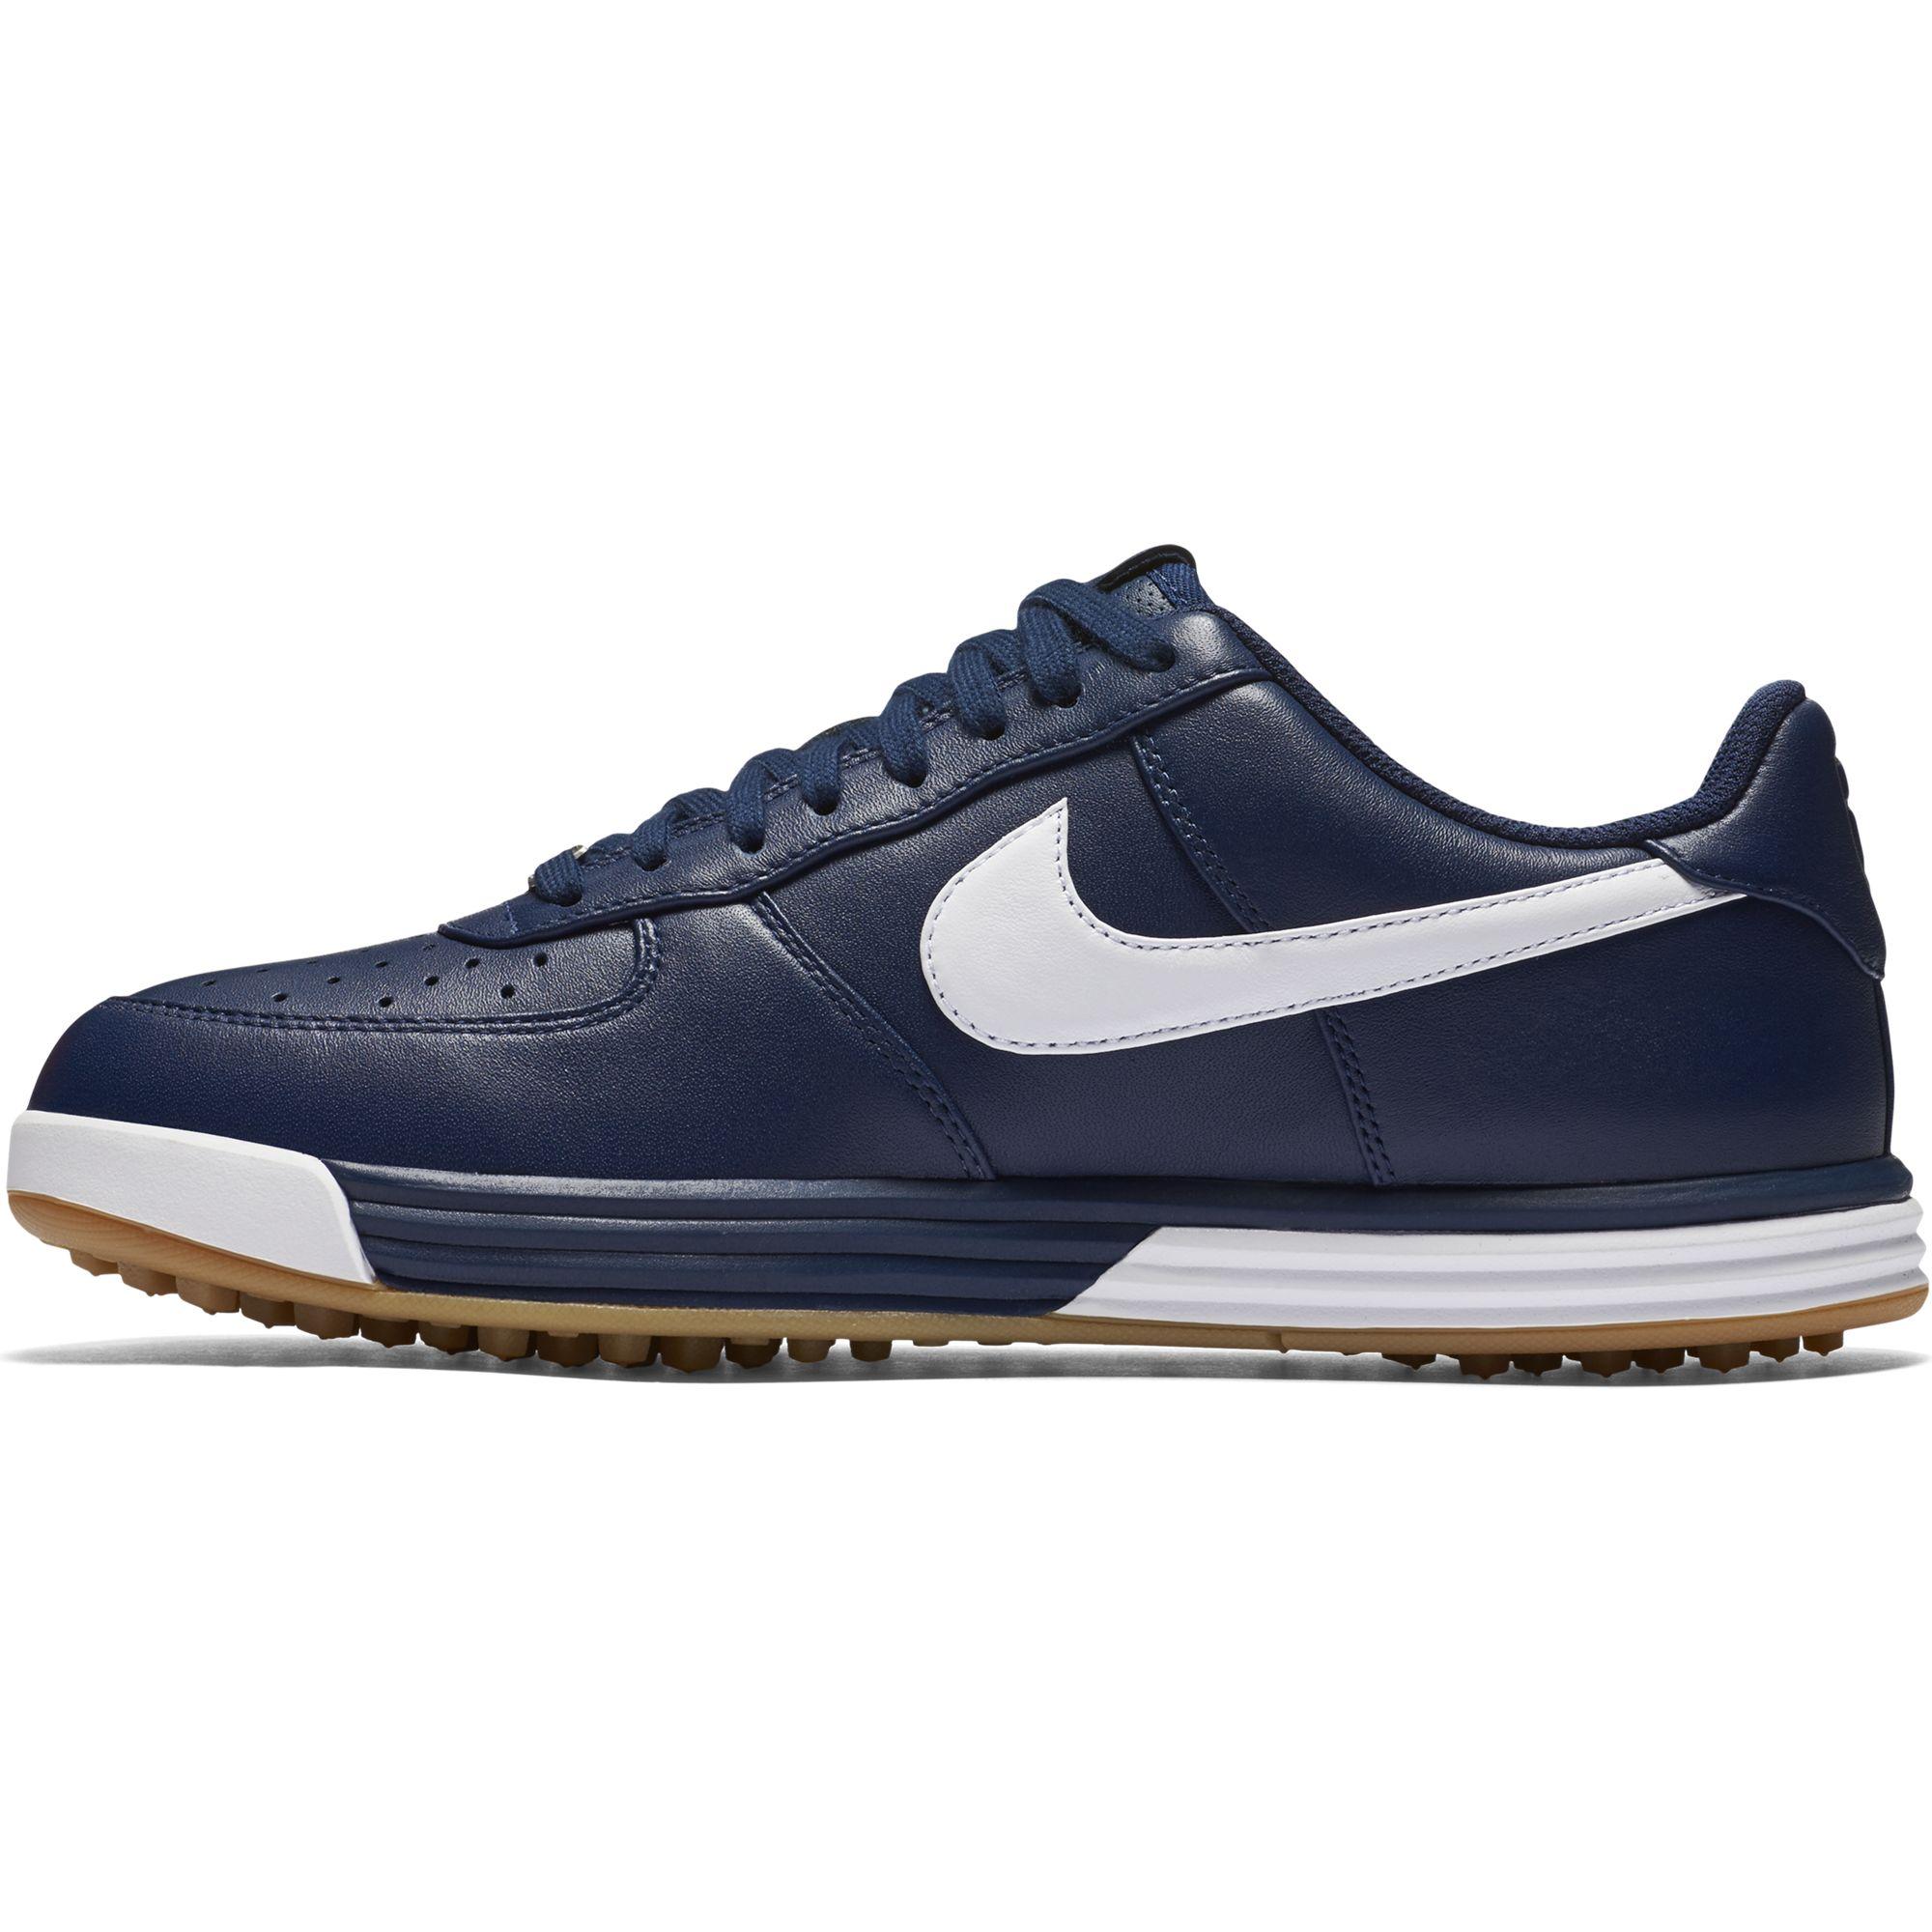 Nike Lunar Force Golf Shoes